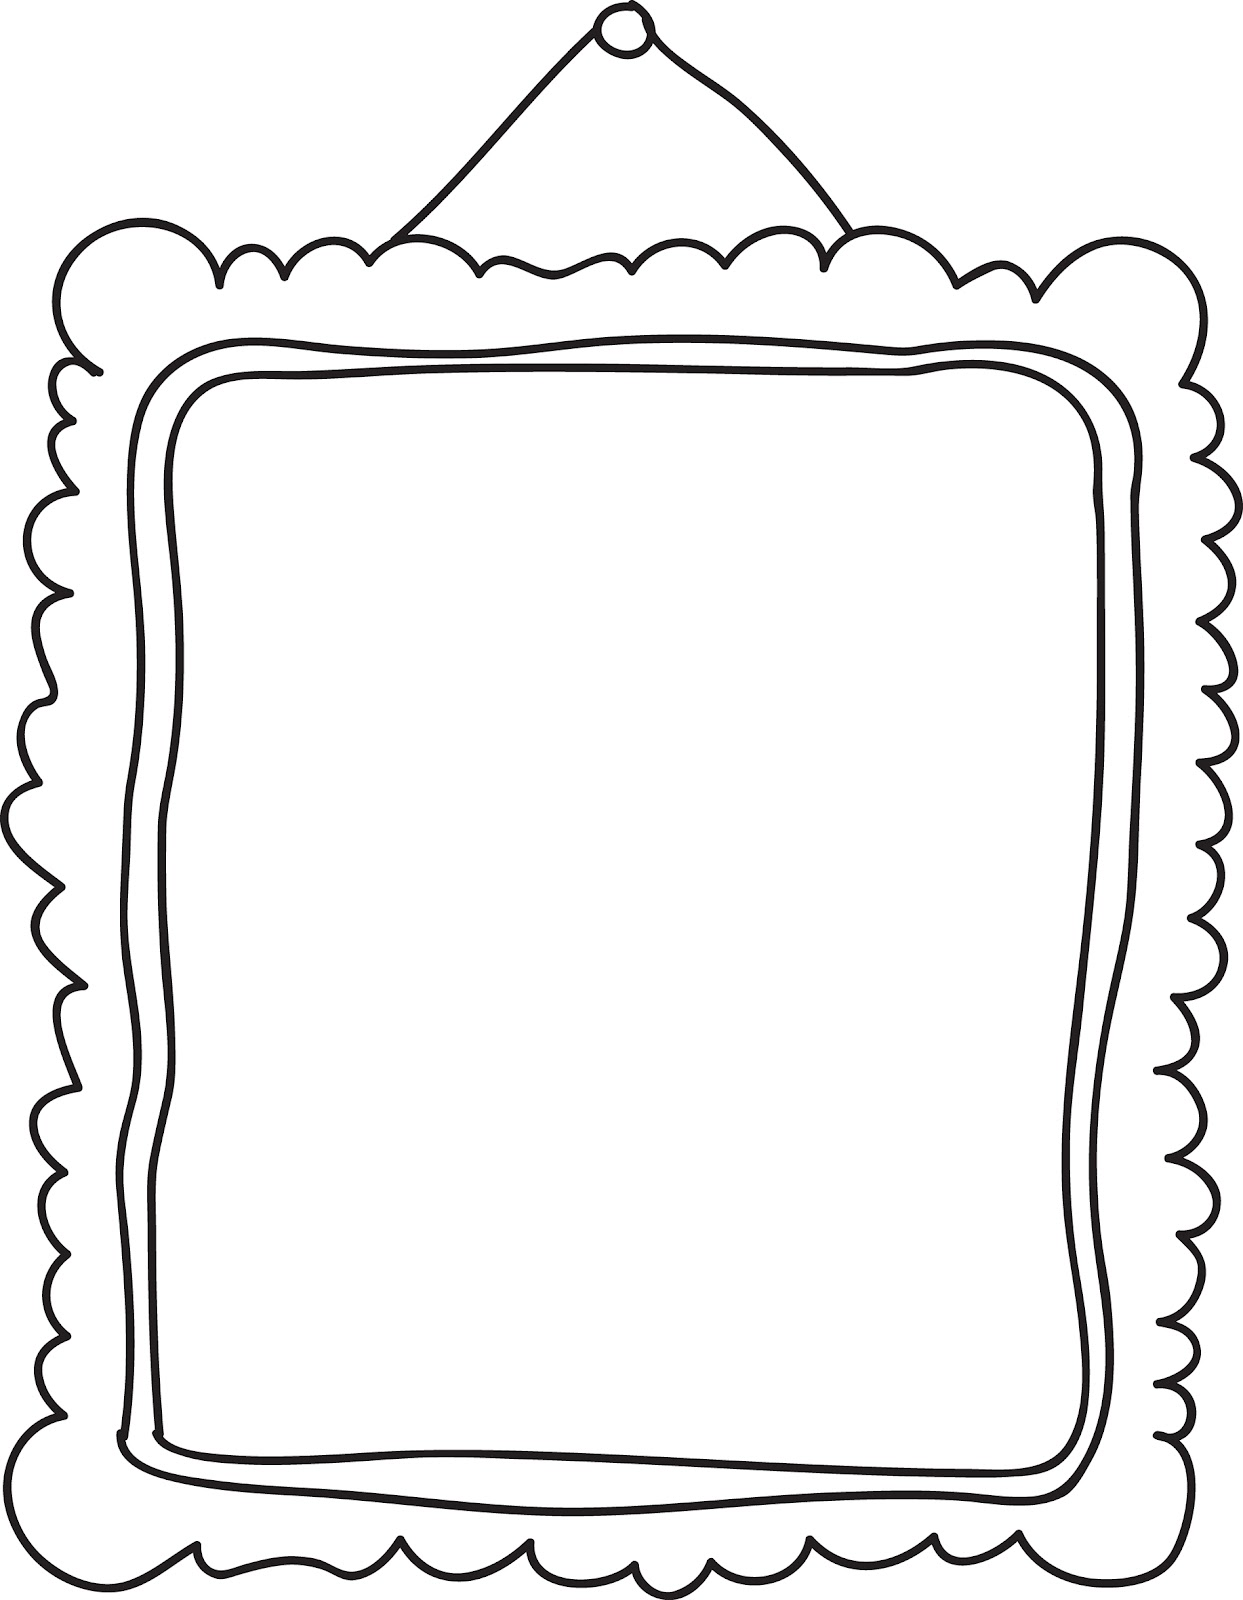 frame clipart - Frame Clipart Free